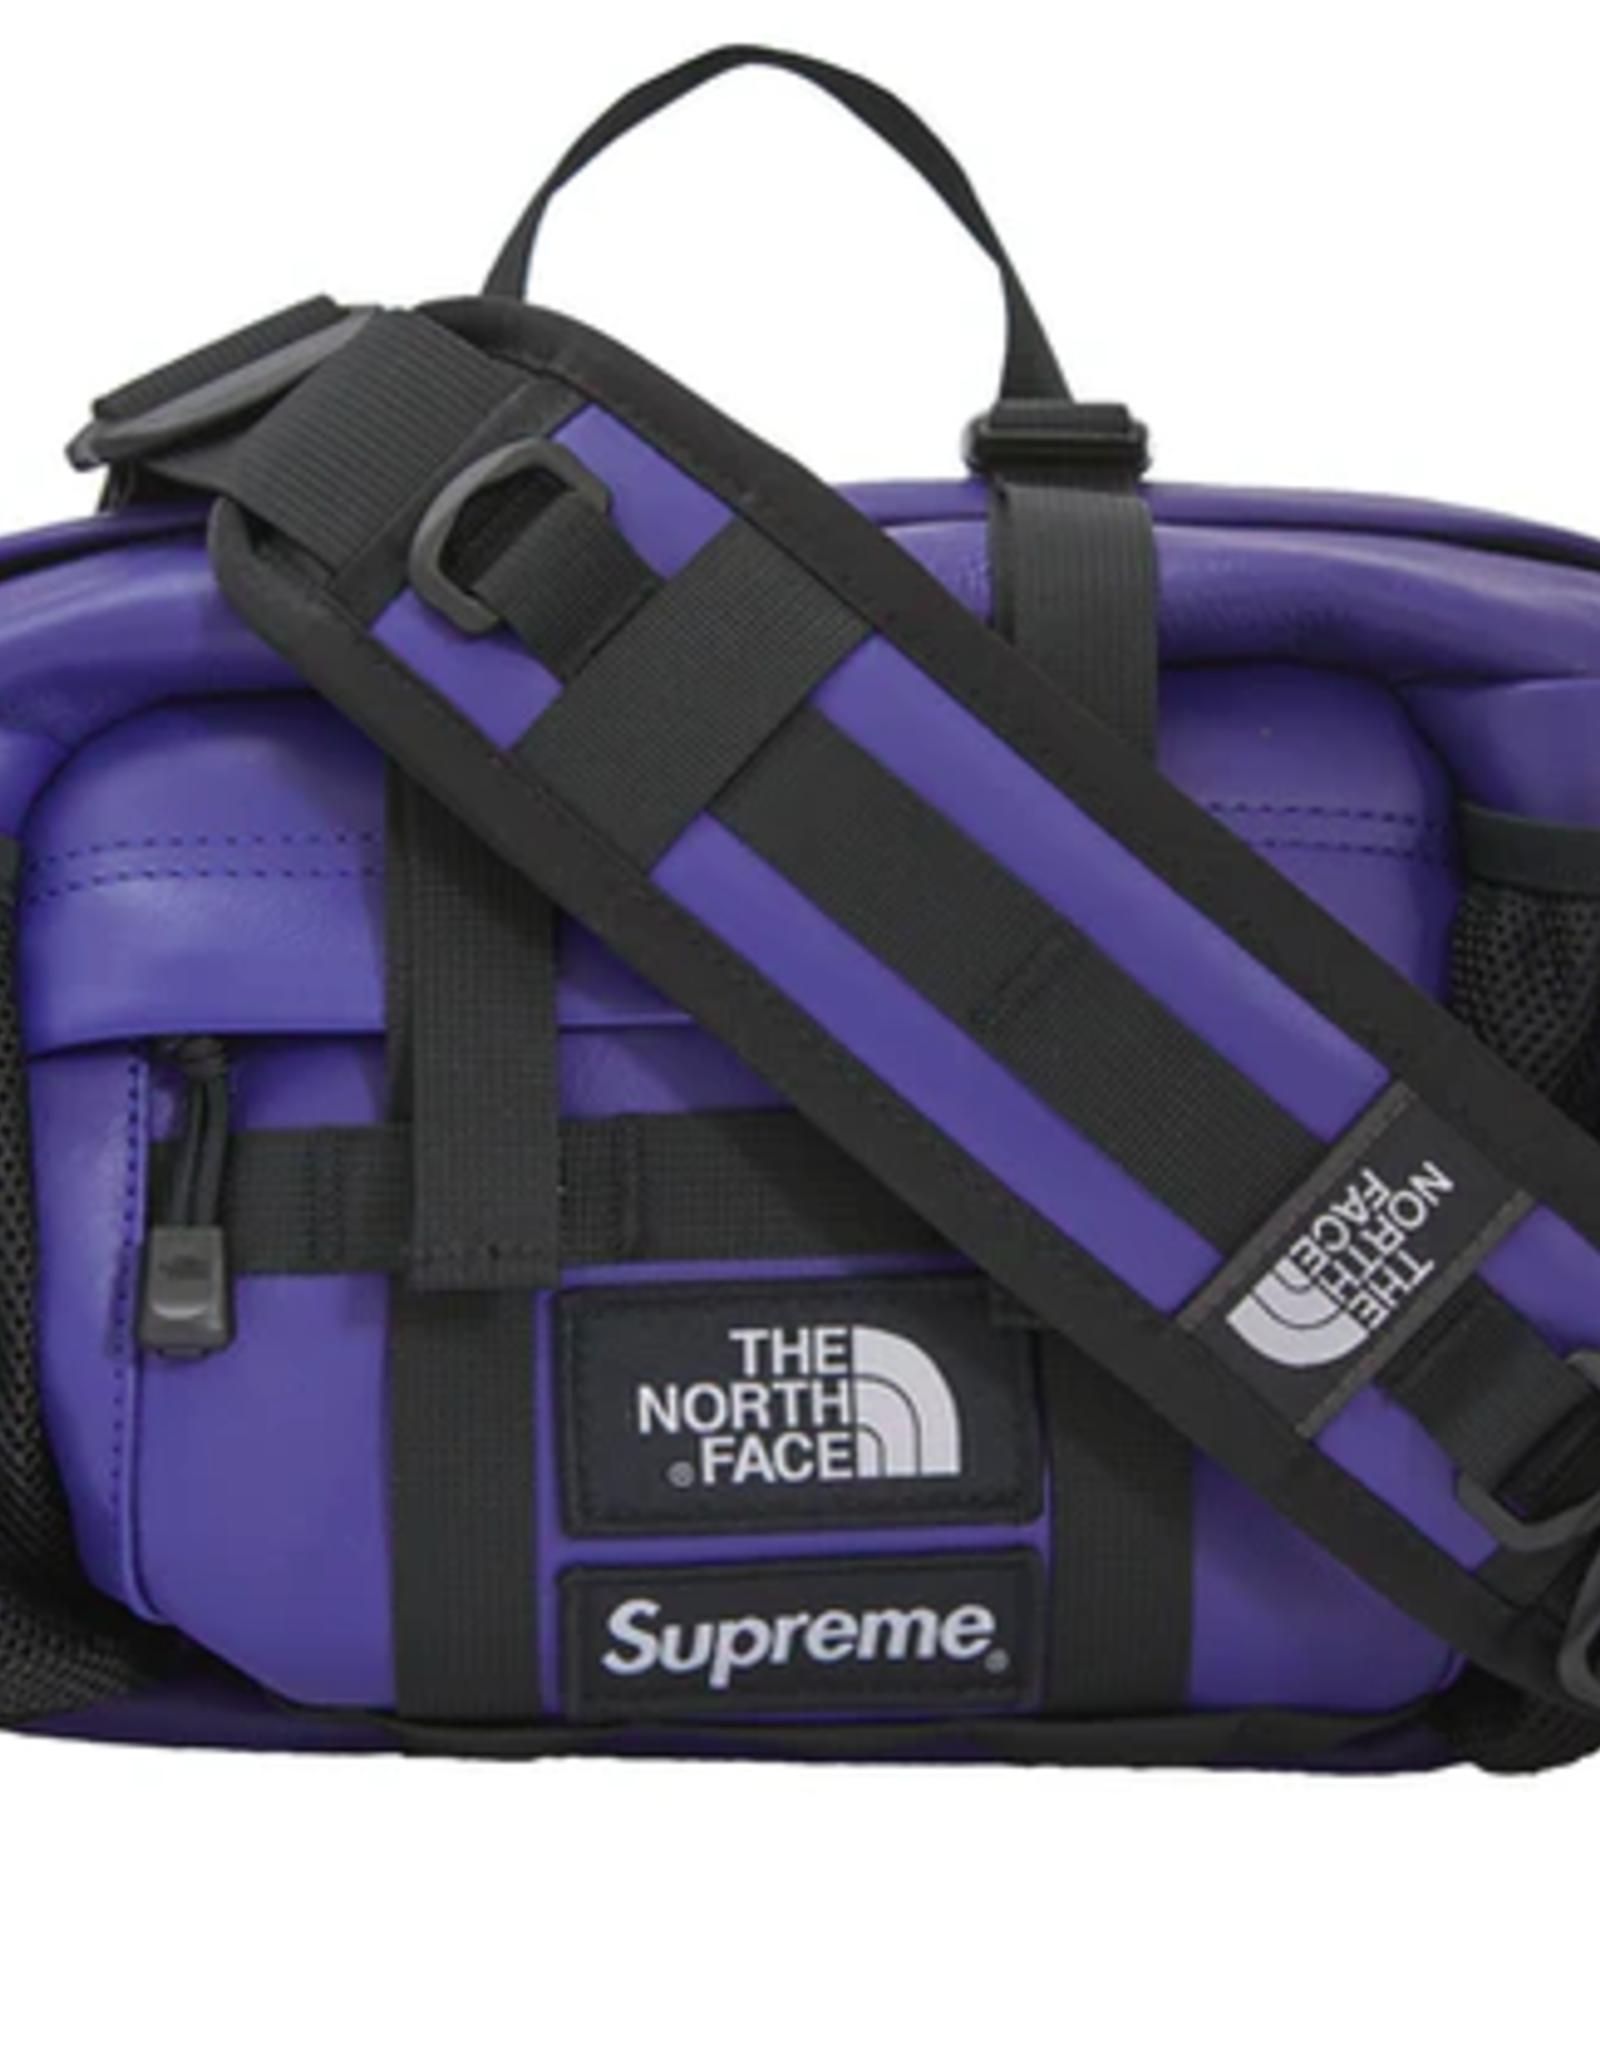 SUPREME Supreme The North Face Leather Mountain Waist Bag Royal WORN